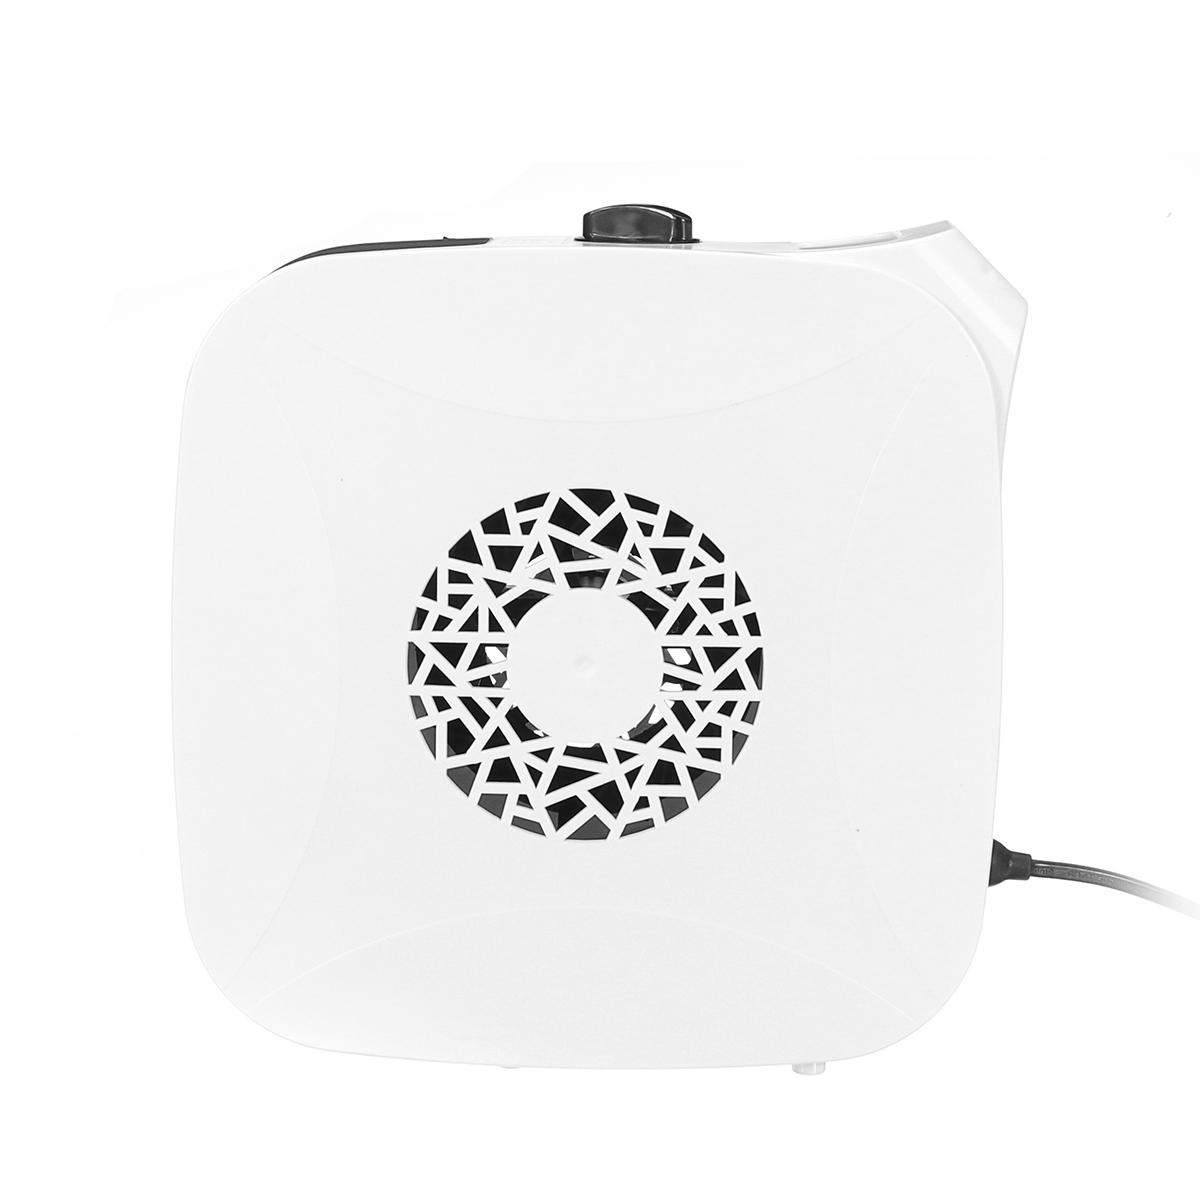 700W 220V Mini Electric Heater Fan Portable Winter Warmer Room Office Heating Machine